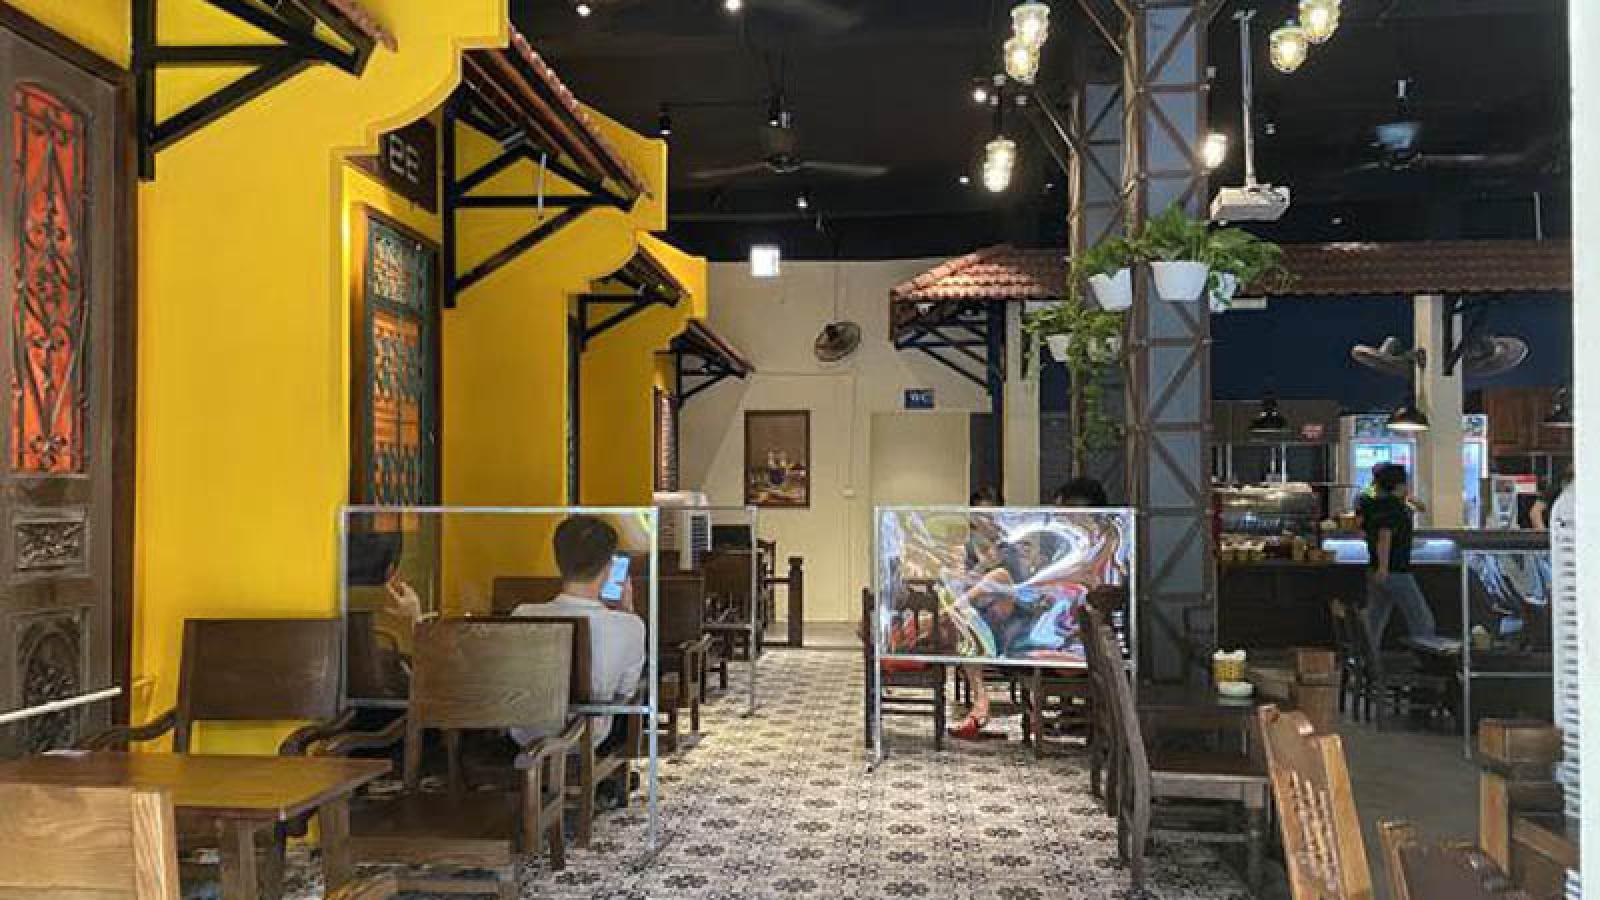 Hanoi cafes seek to follow social distancing measures